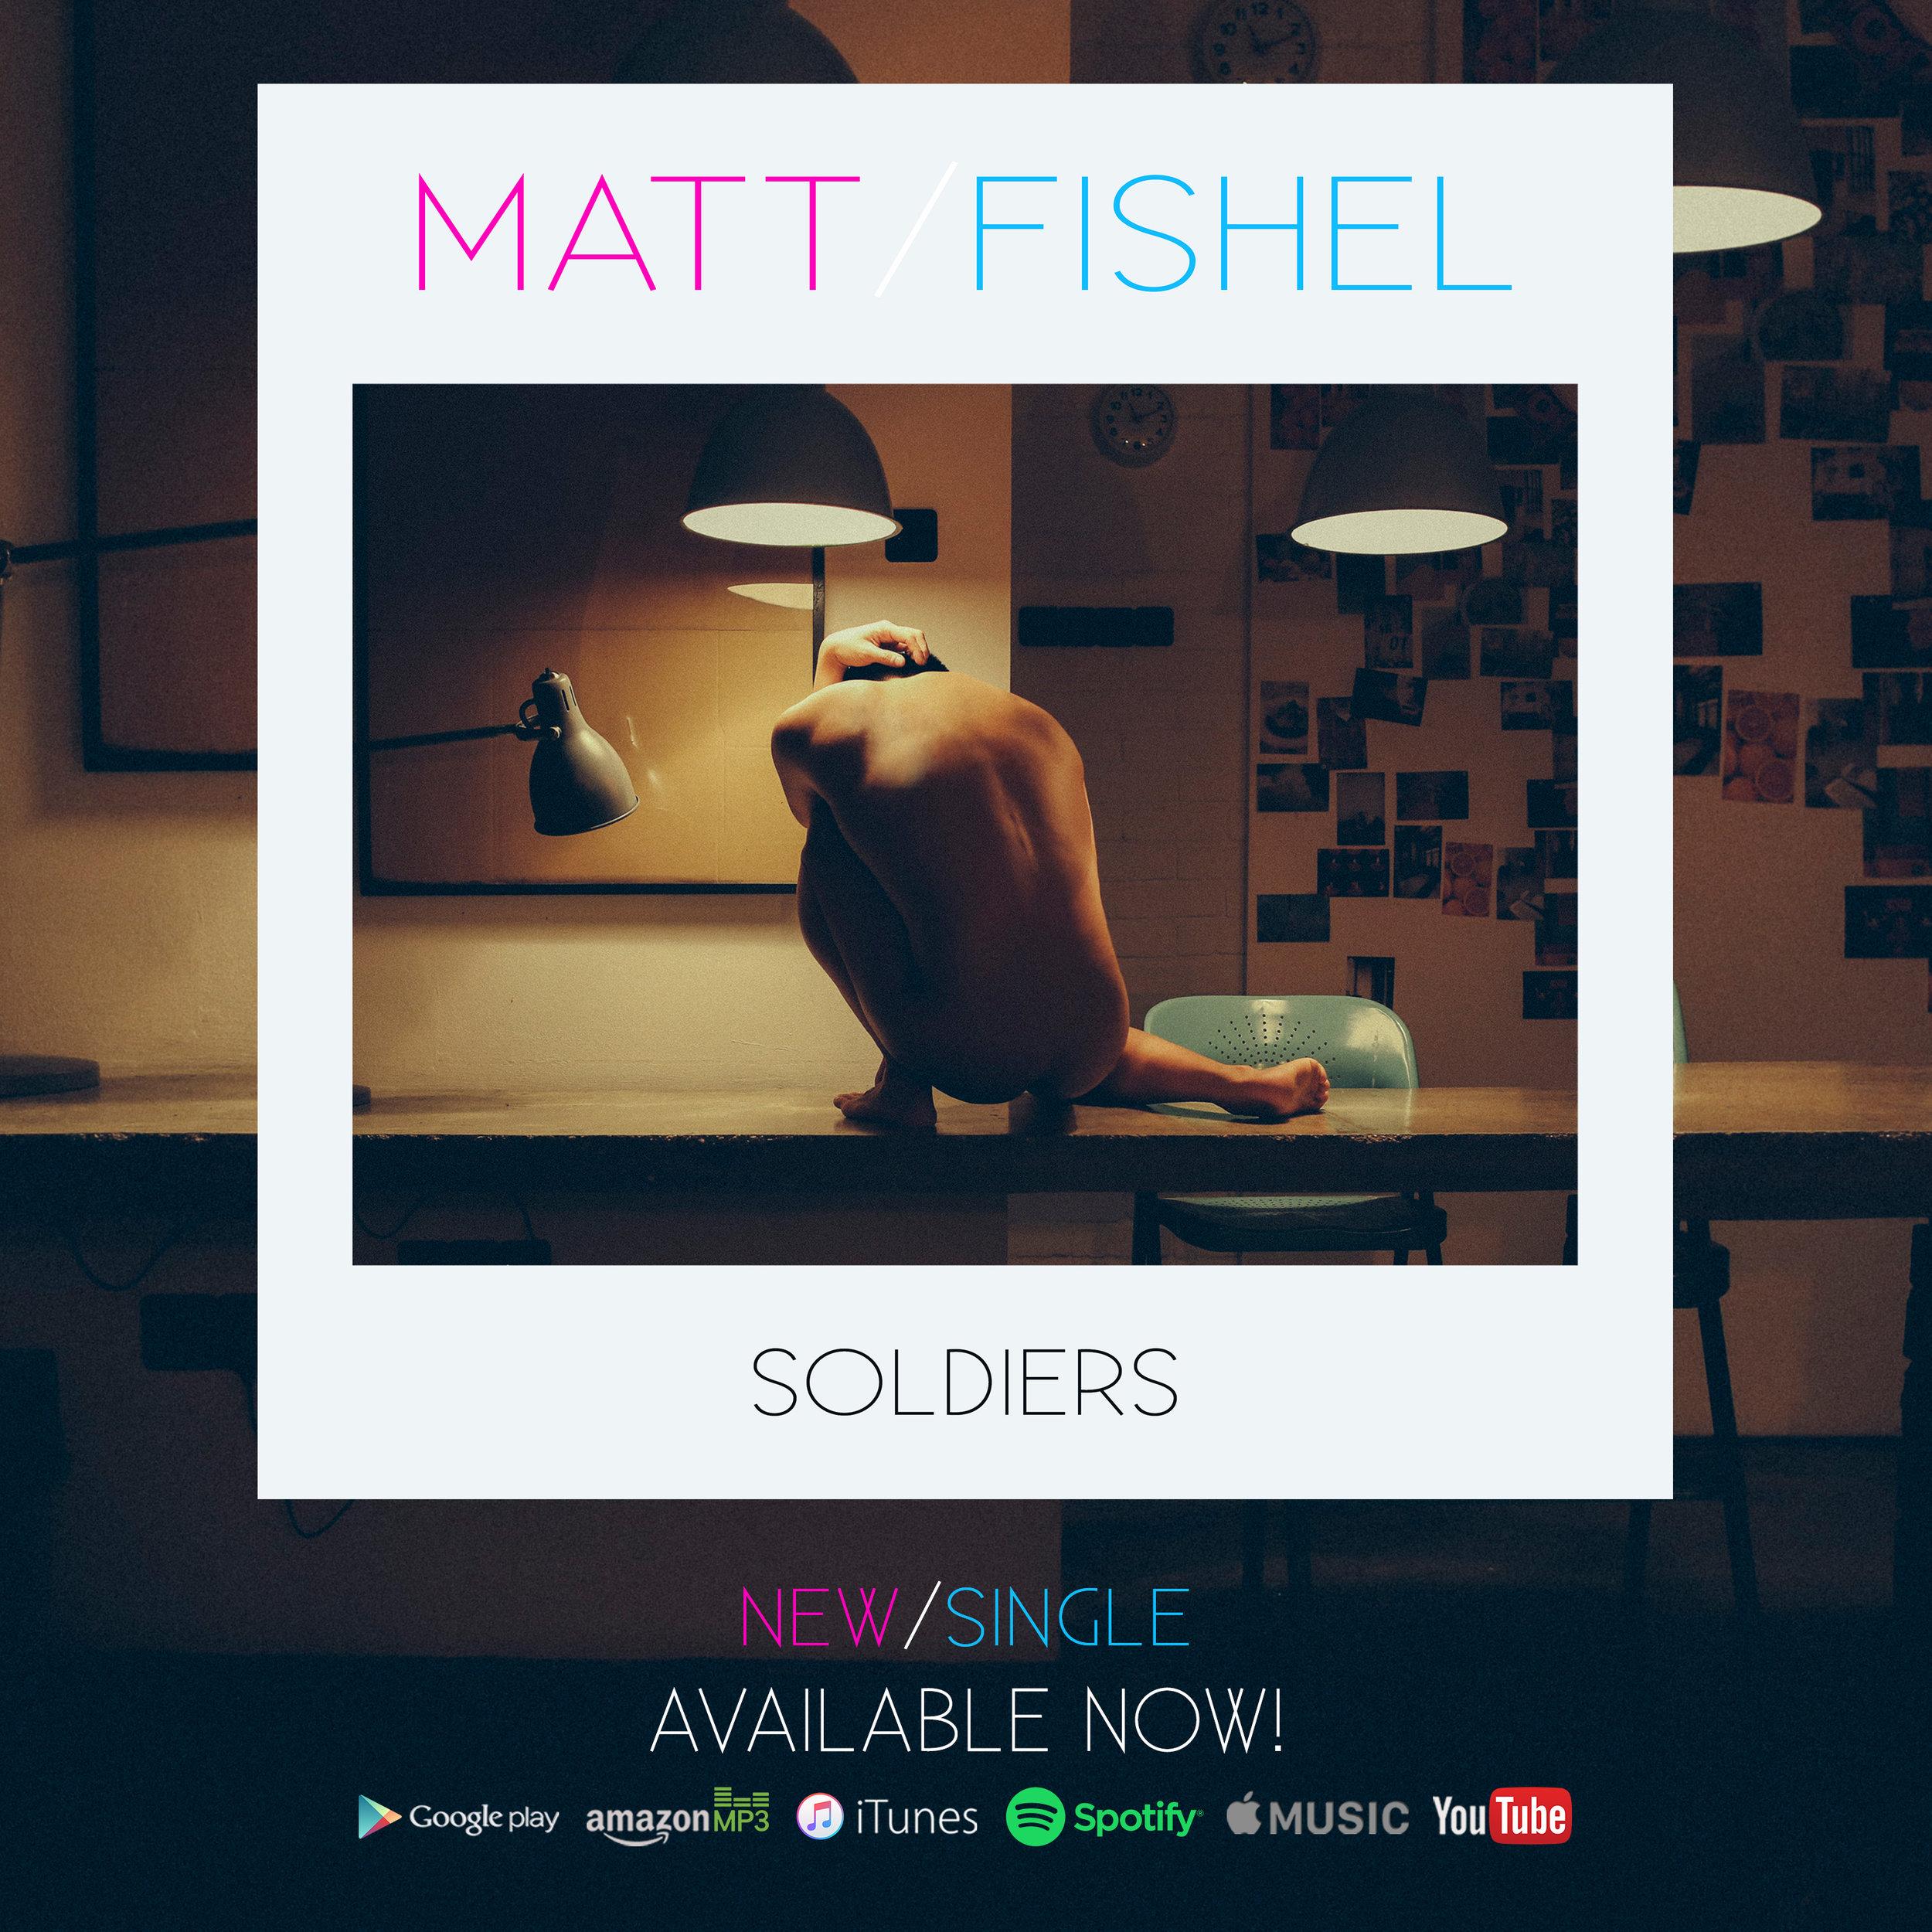 Matt FIshel_Soldiers_02.jpg